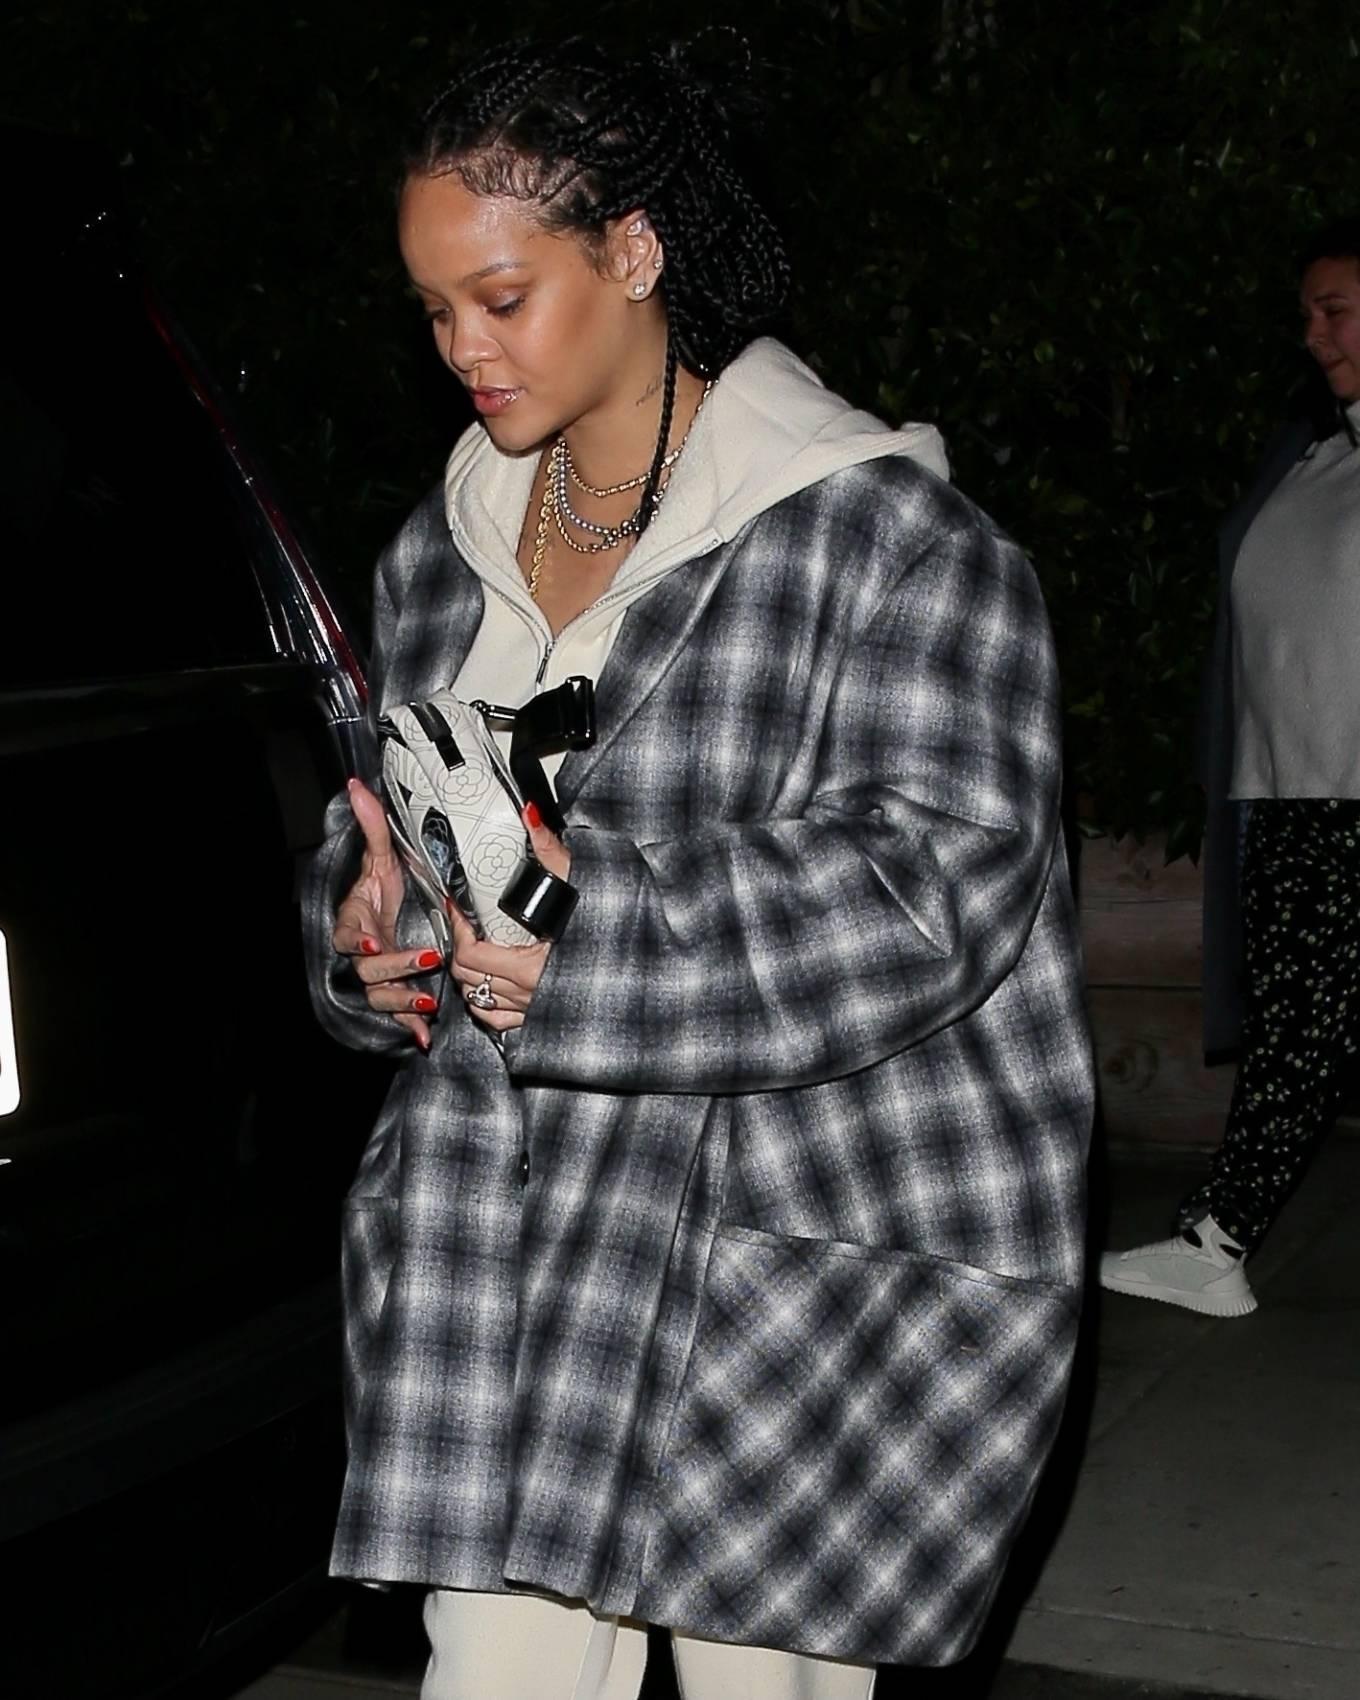 Rihanna - Make up free in Santa Monica